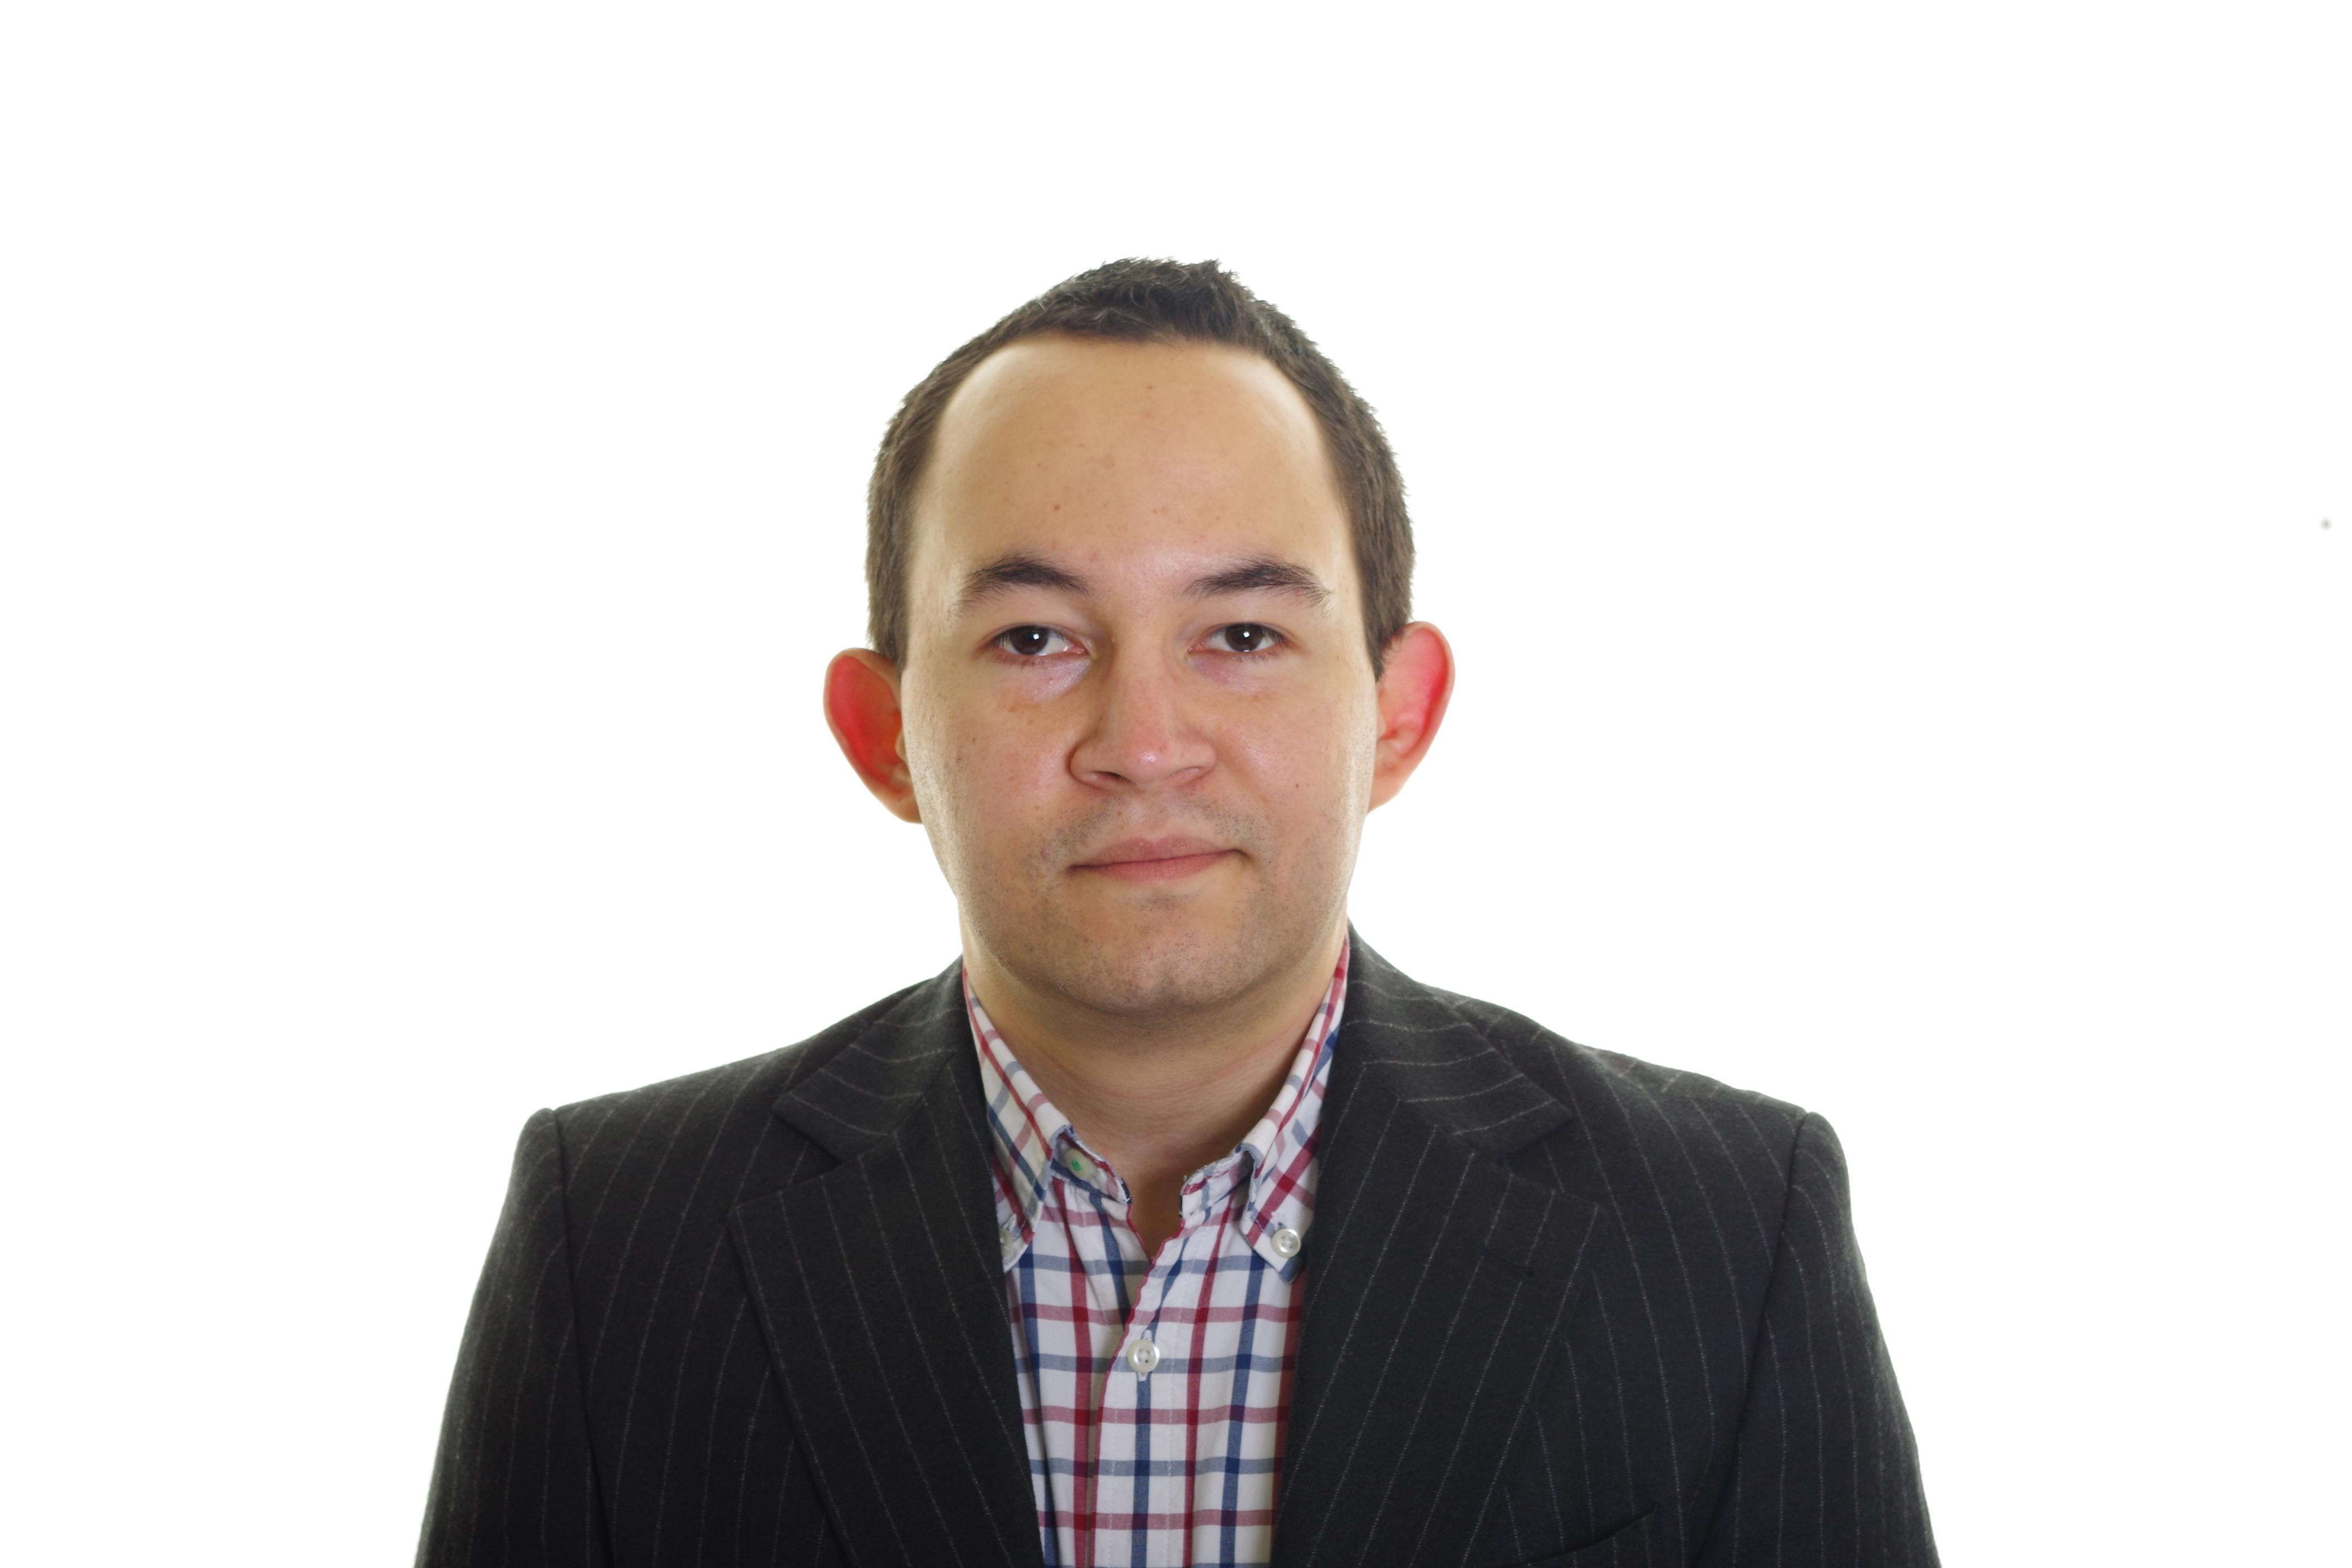 Rafael Sanchez Crespo